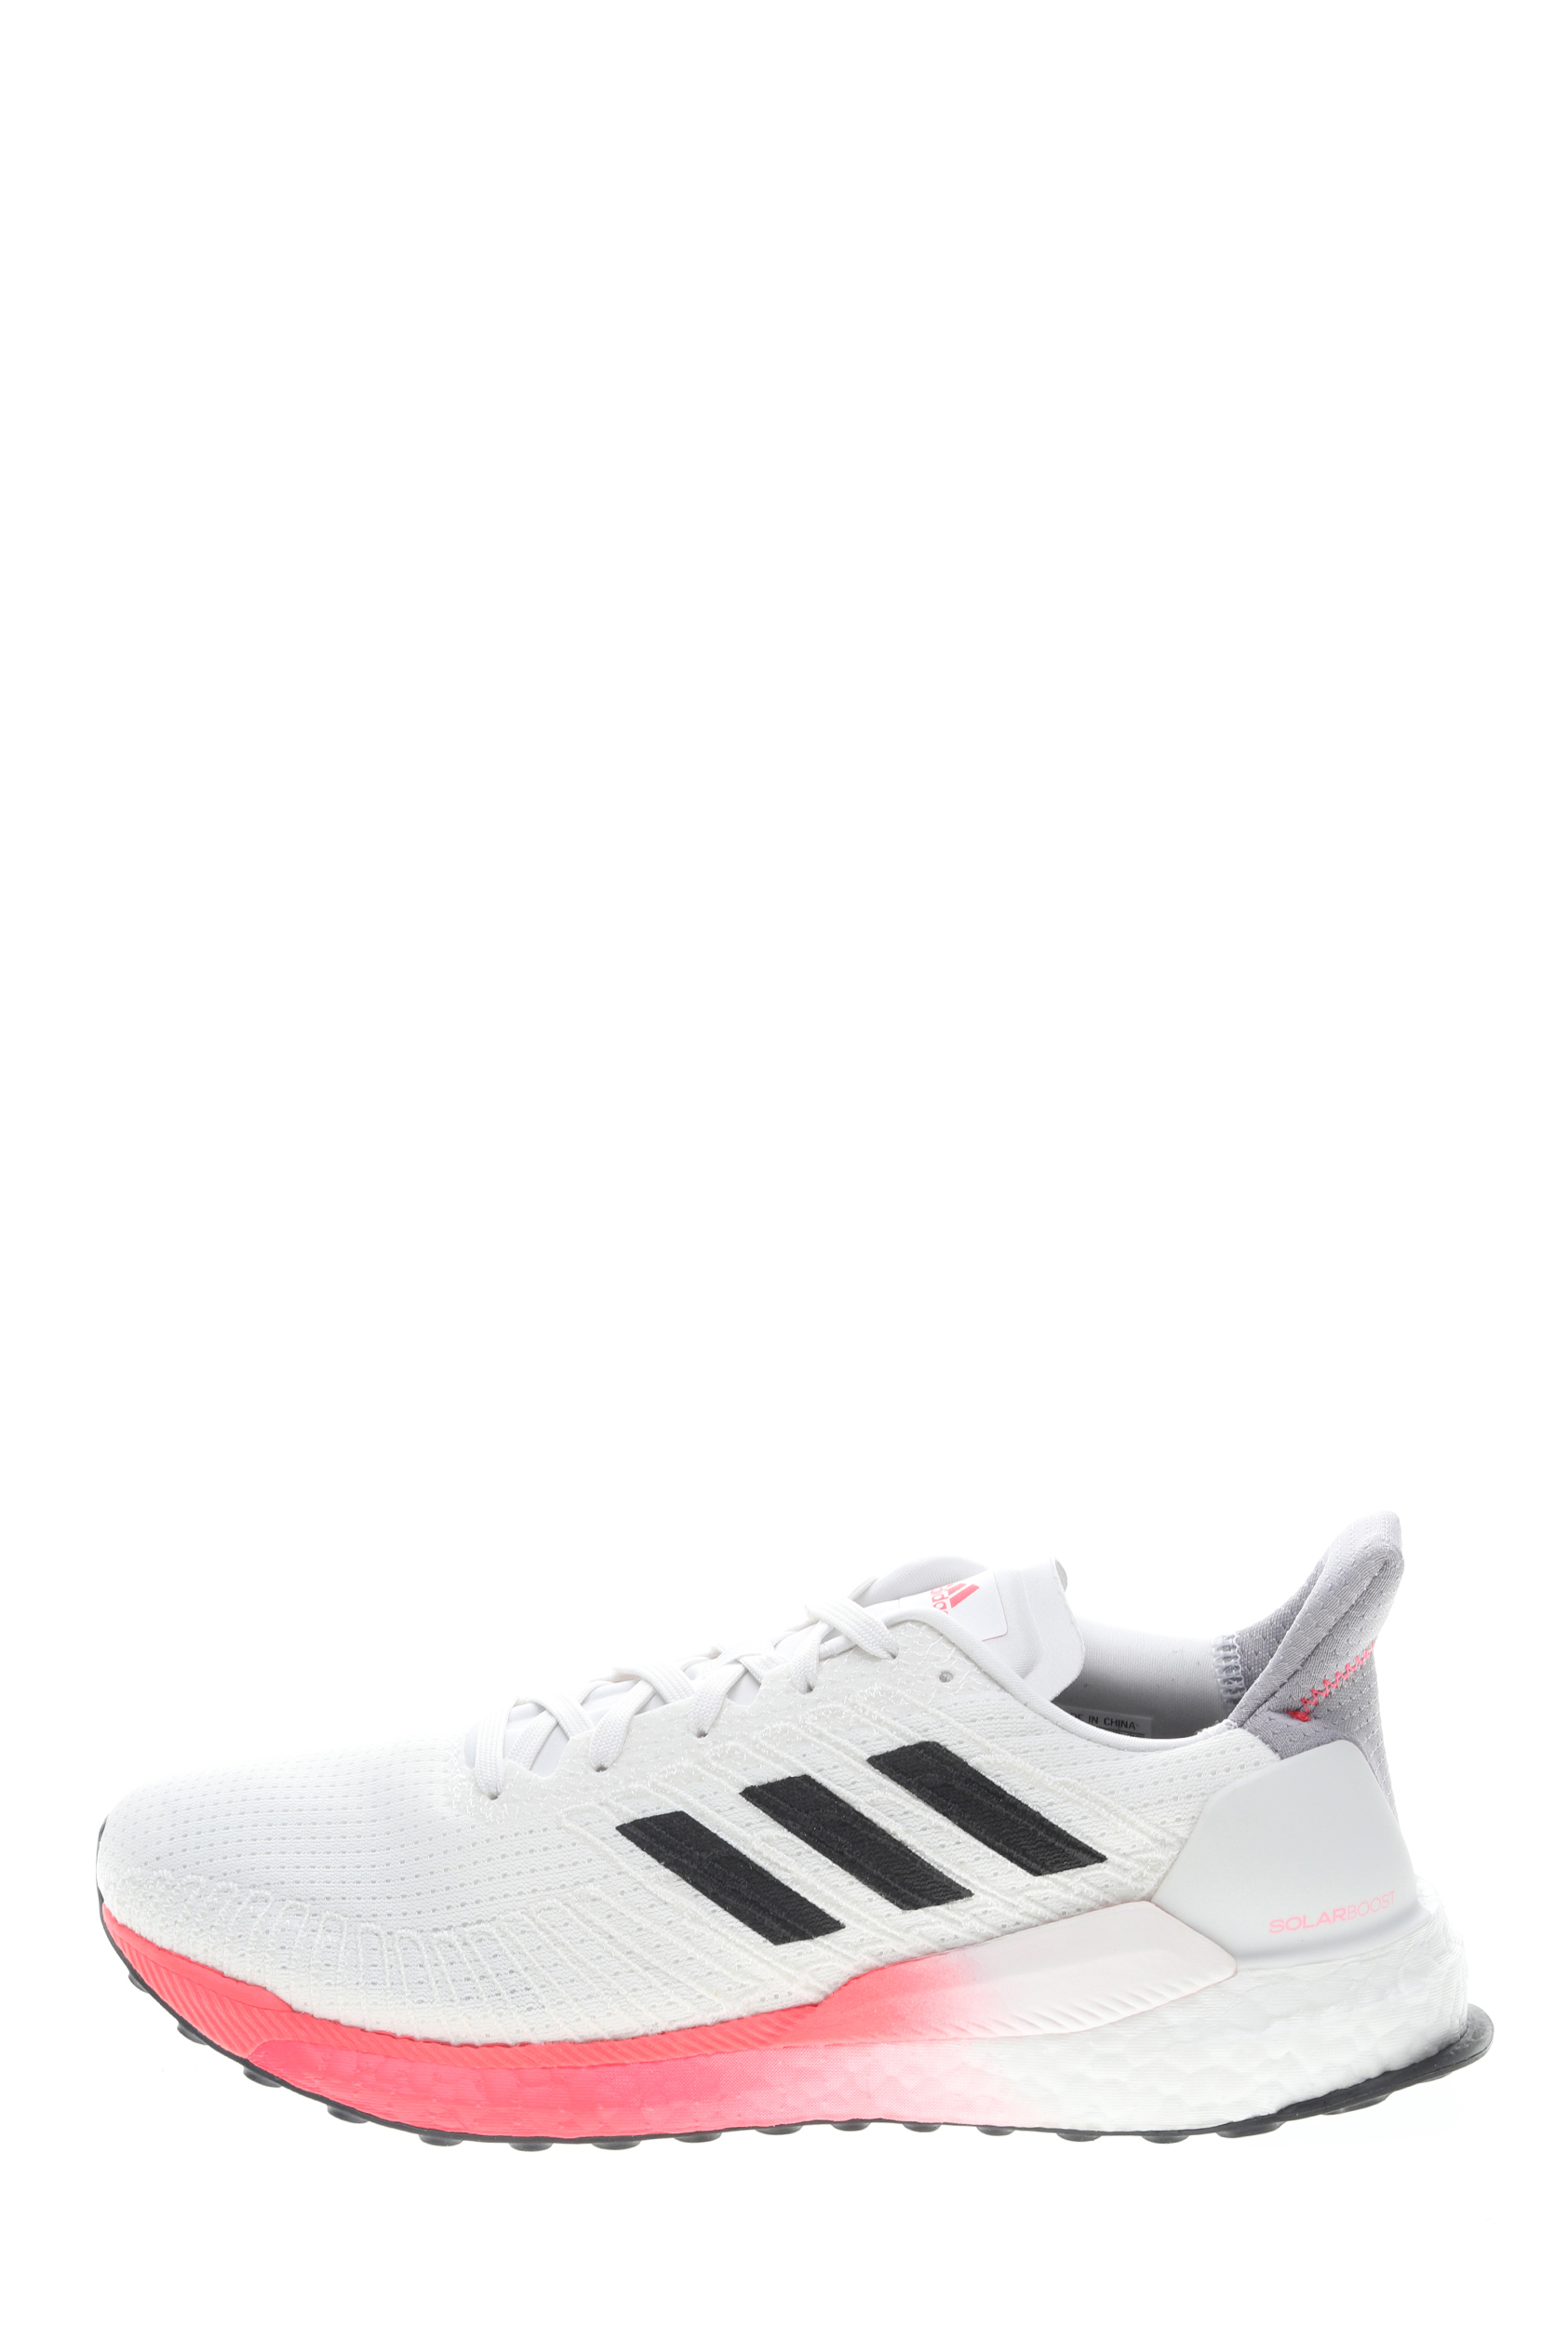 adidas Performance – Ανδρικά παπούτσια running adidas Performance SOLAR BOOST λευκά κόκκινα